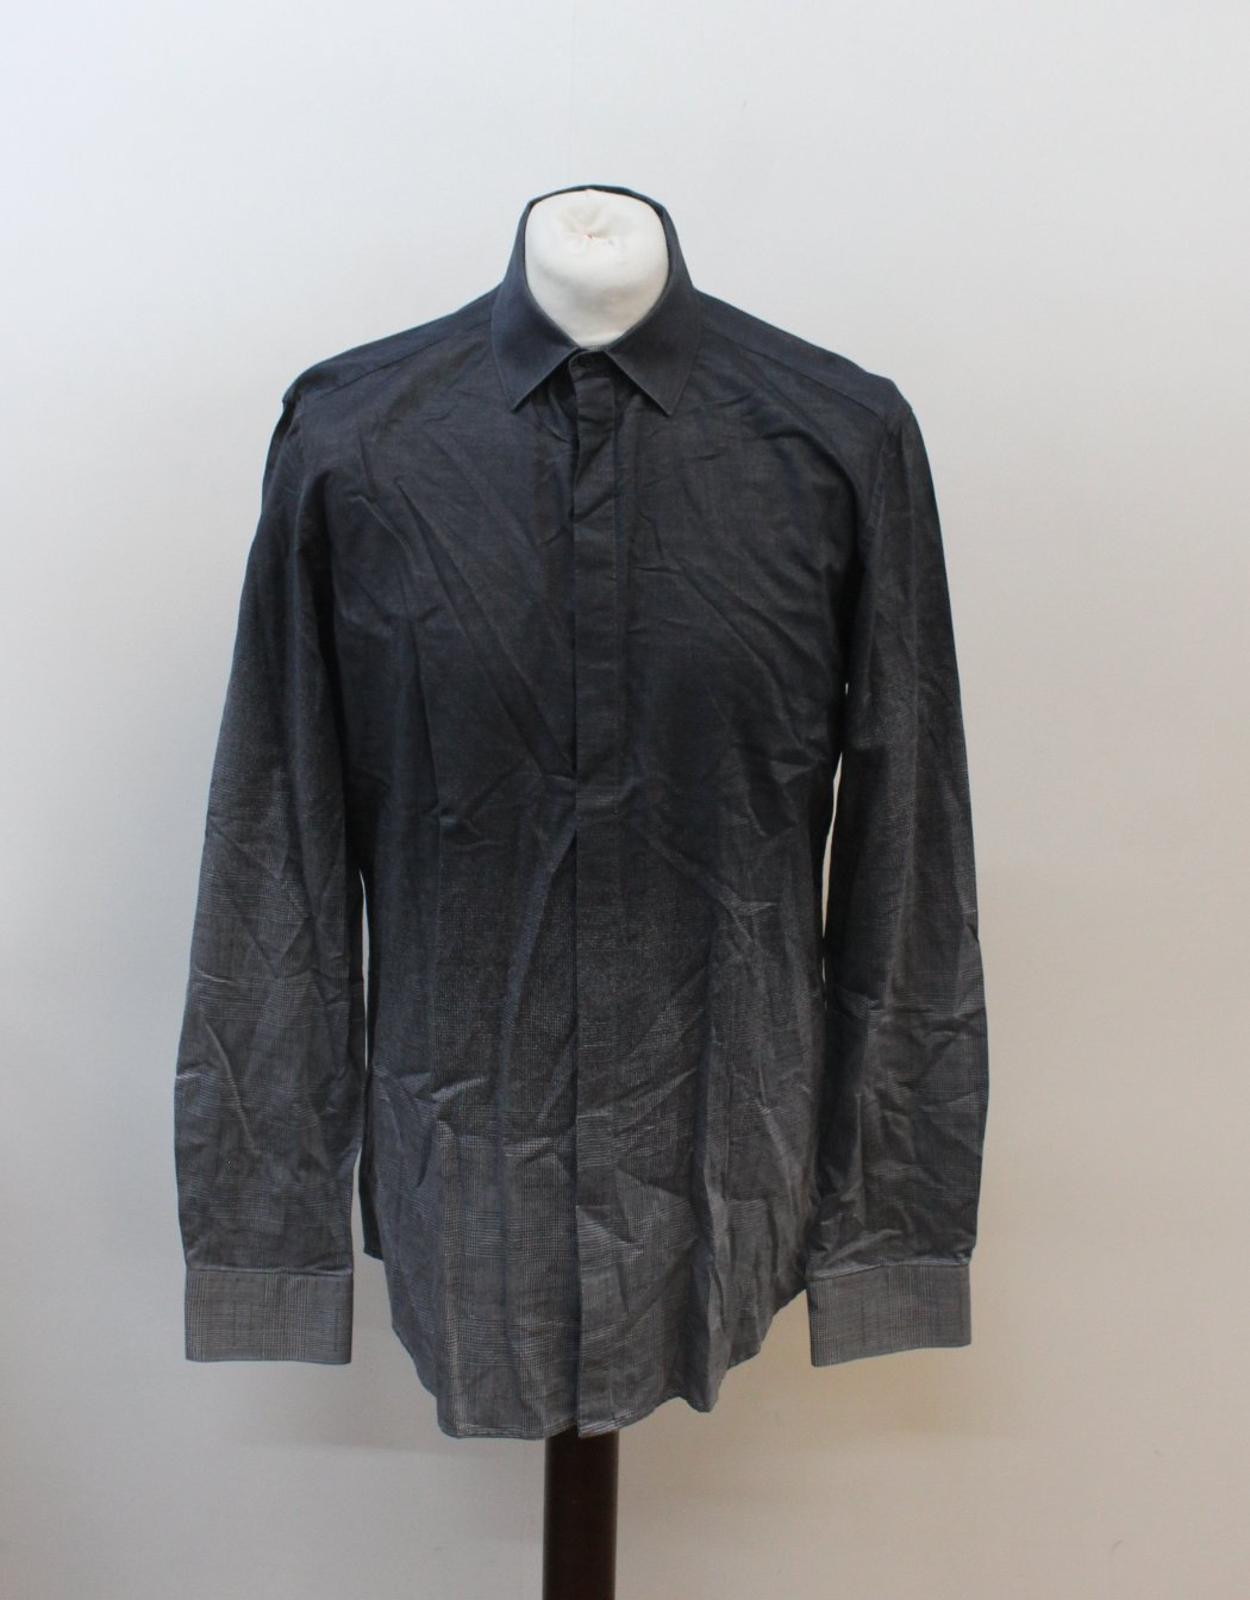 Neil-Barrett-Hombre-Luz-Gris-Oscuro-Algodon-Slim-Fit-Camisa-Cuello-Ombre-16-5-034-42cm miniatura 7